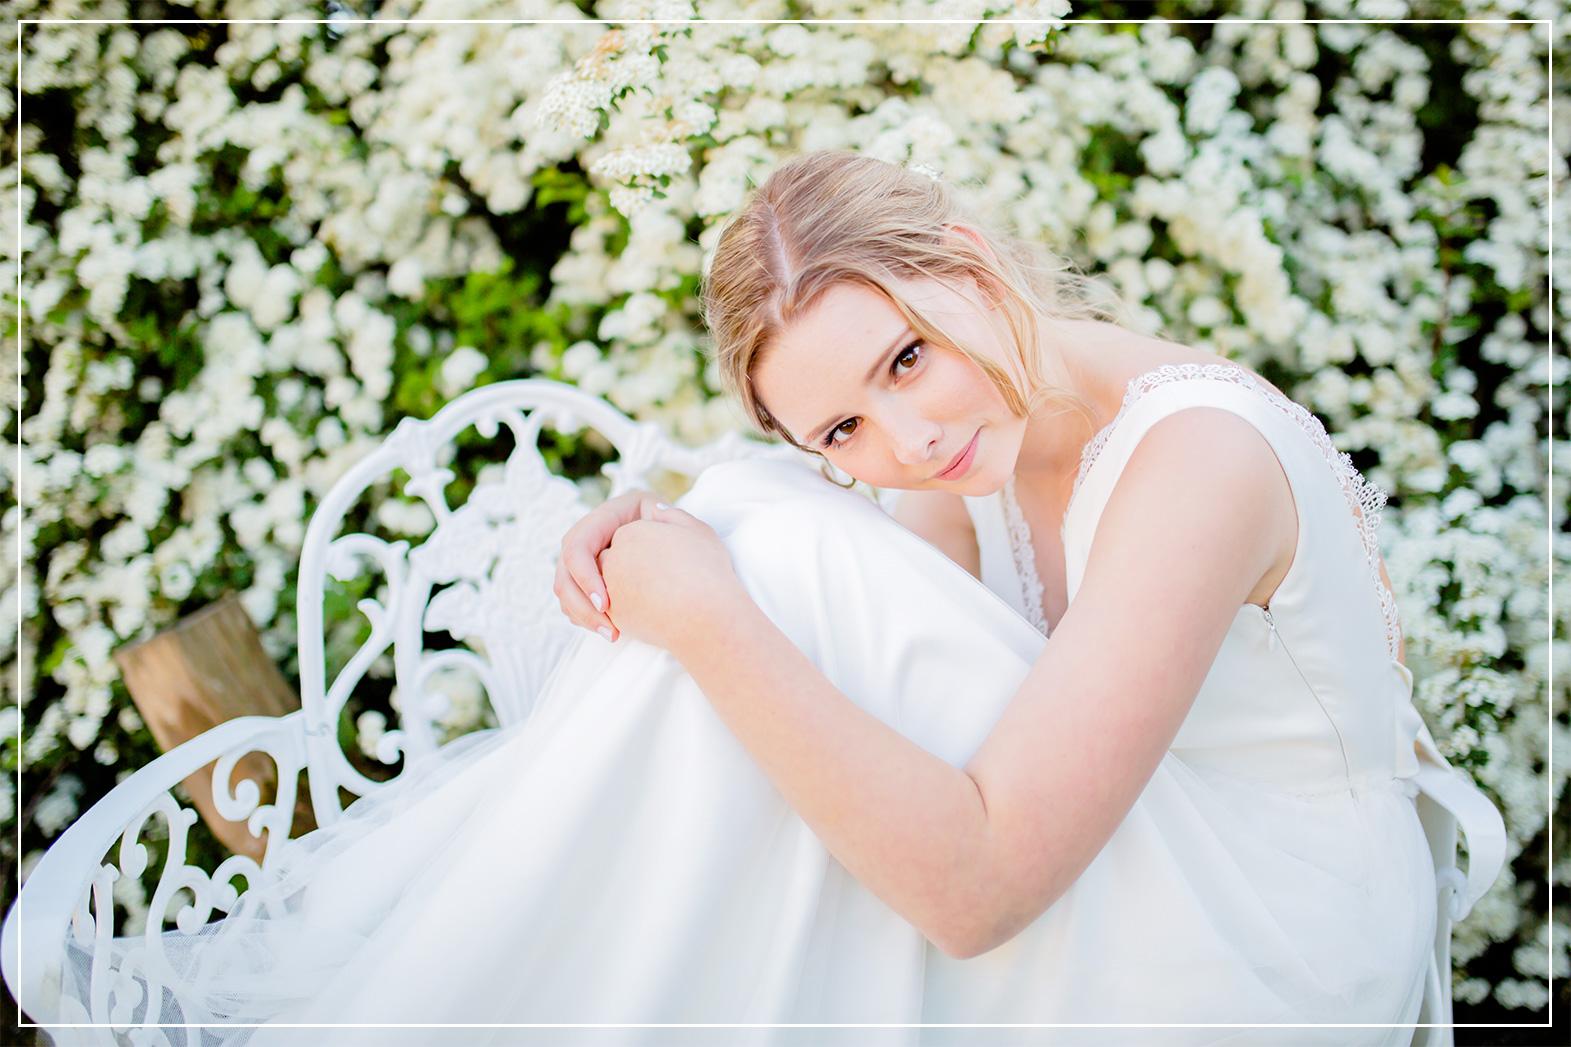 Ellie Pendry bespoke bridal dress